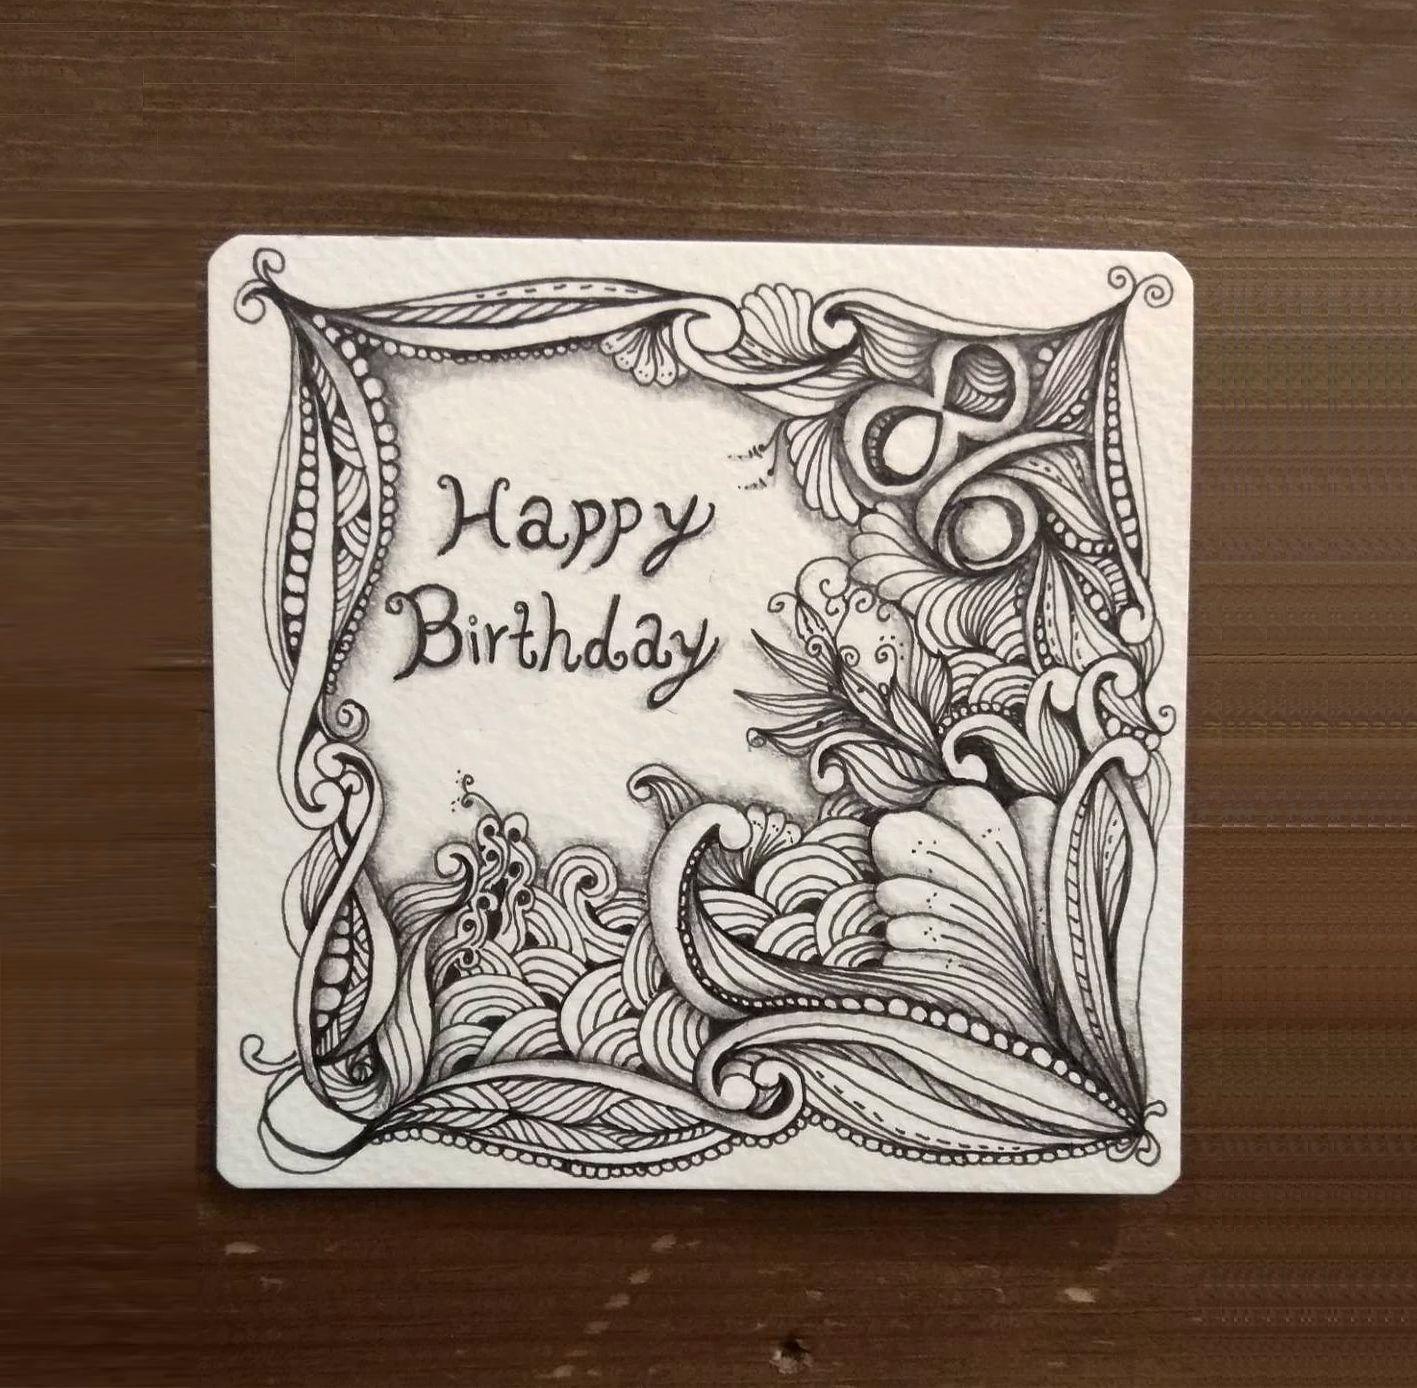 HAPPY BIRTHDAY card zentangle ART  Zentangle artwork, Zentangle